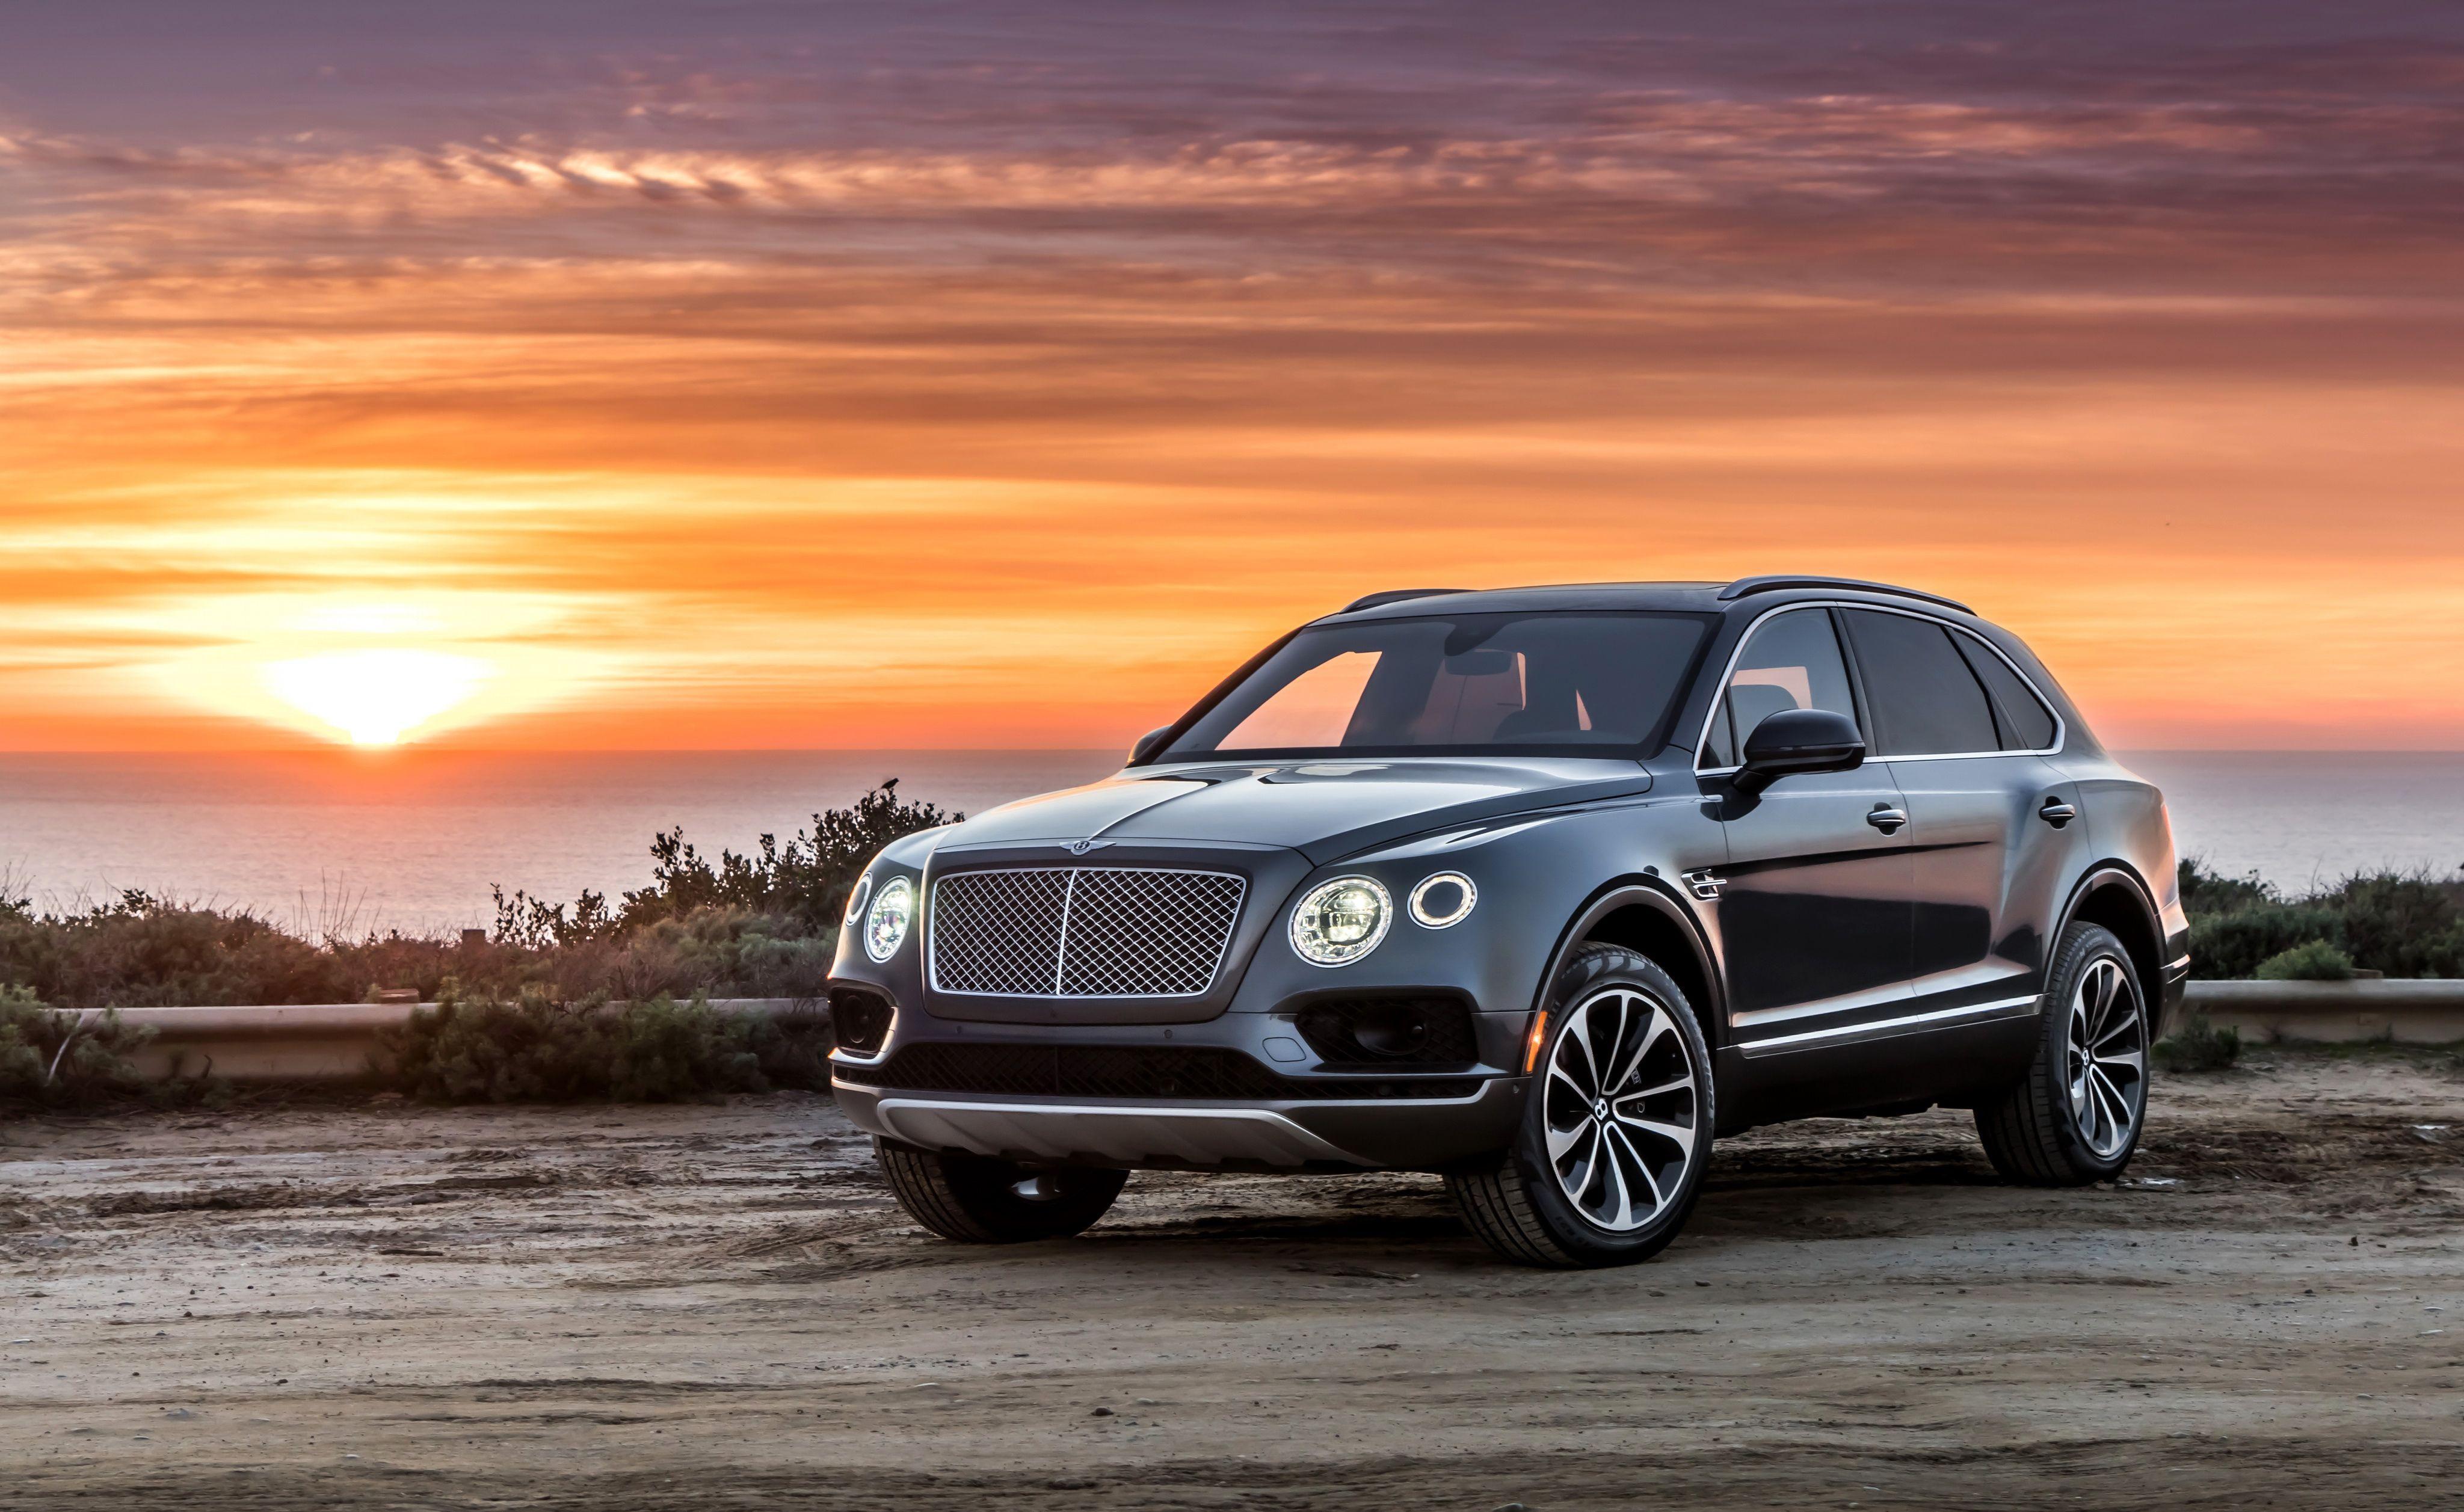 Bentley Bentayga Wallpapers Top Free Bentley Bentayga Backgrounds Wallpaperaccess